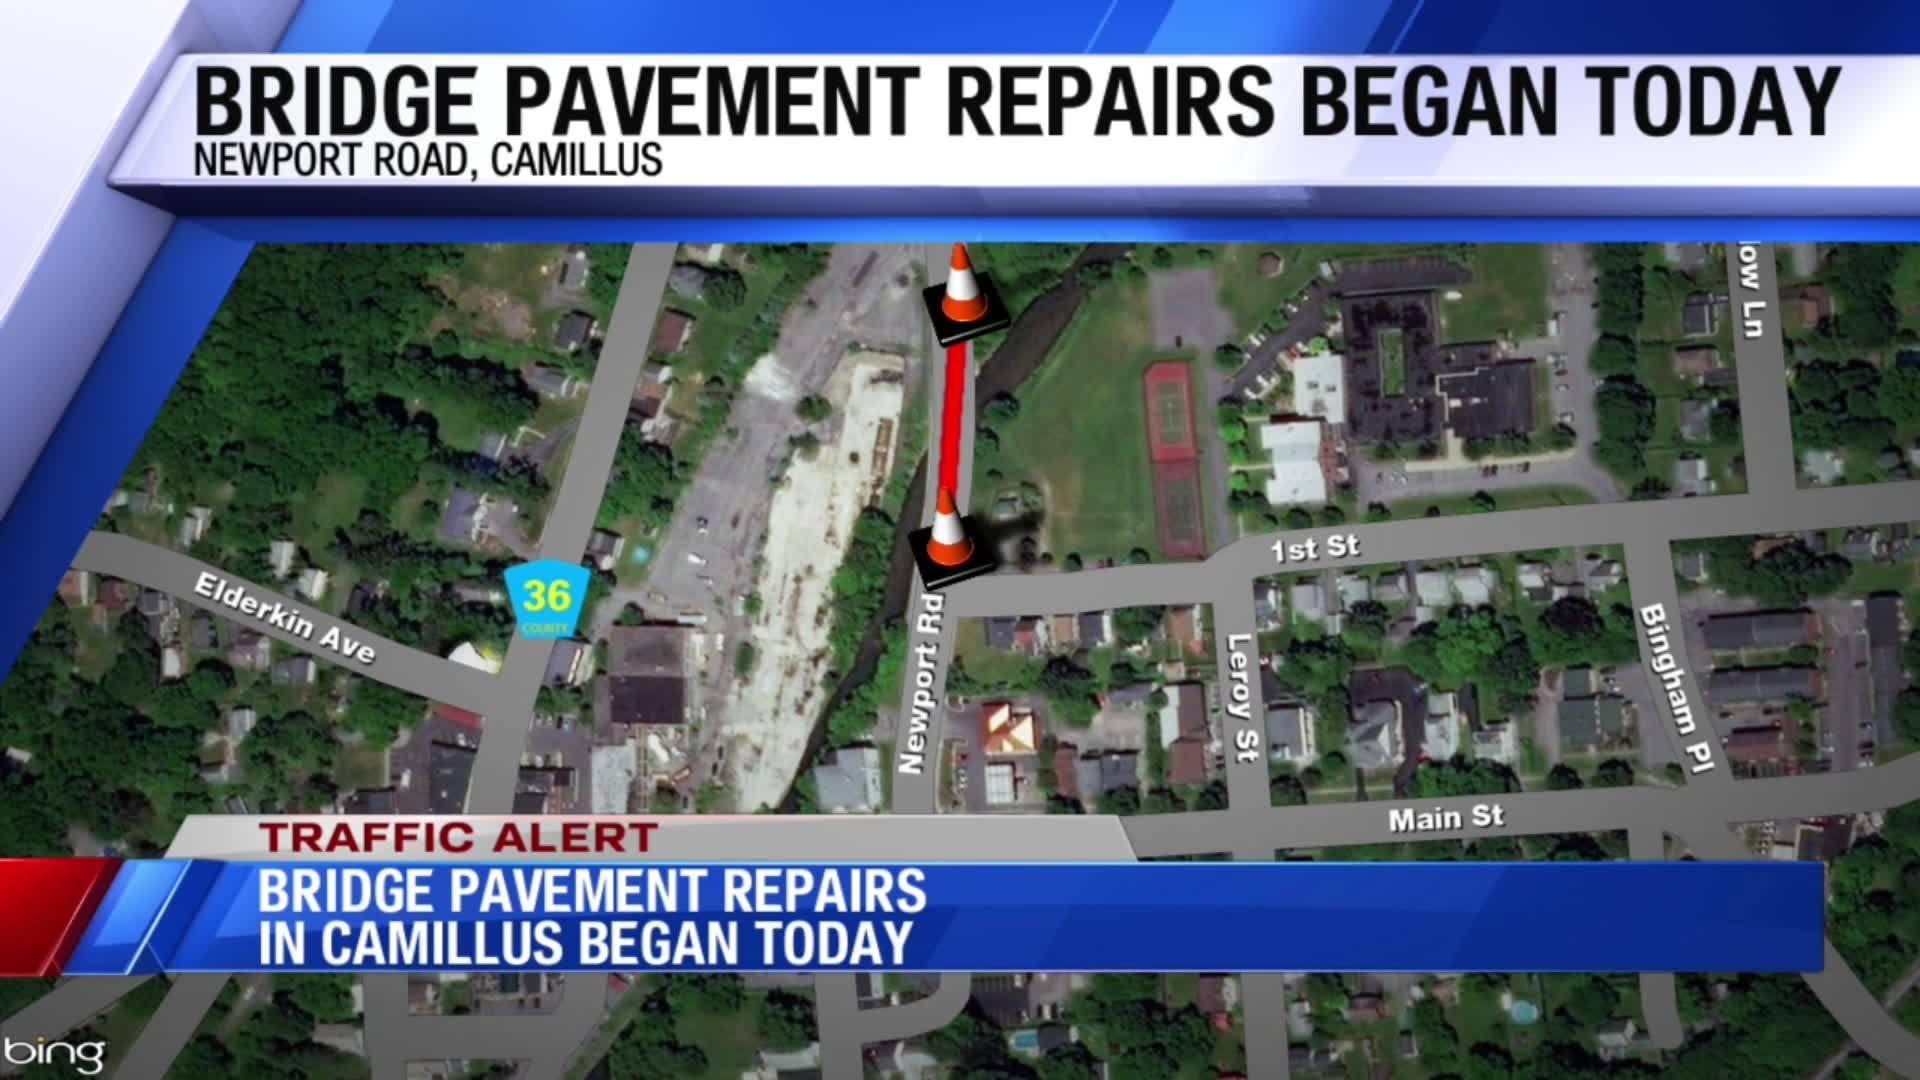 Bridge_pavement_repairs_begin_on_Newport_7_20190506162008